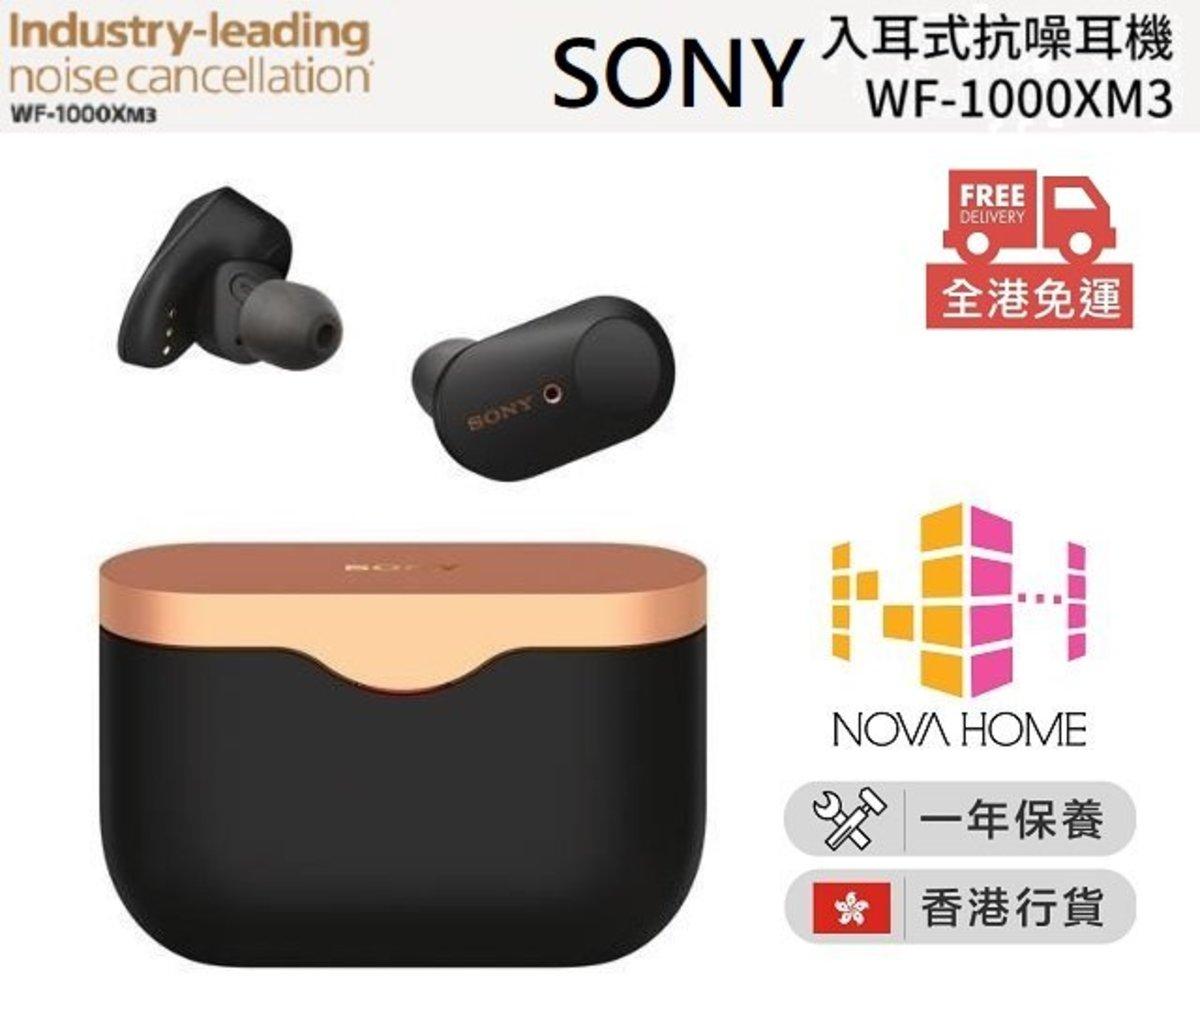 Sony WF-1000XM3 全無線降噪耳機 黑色